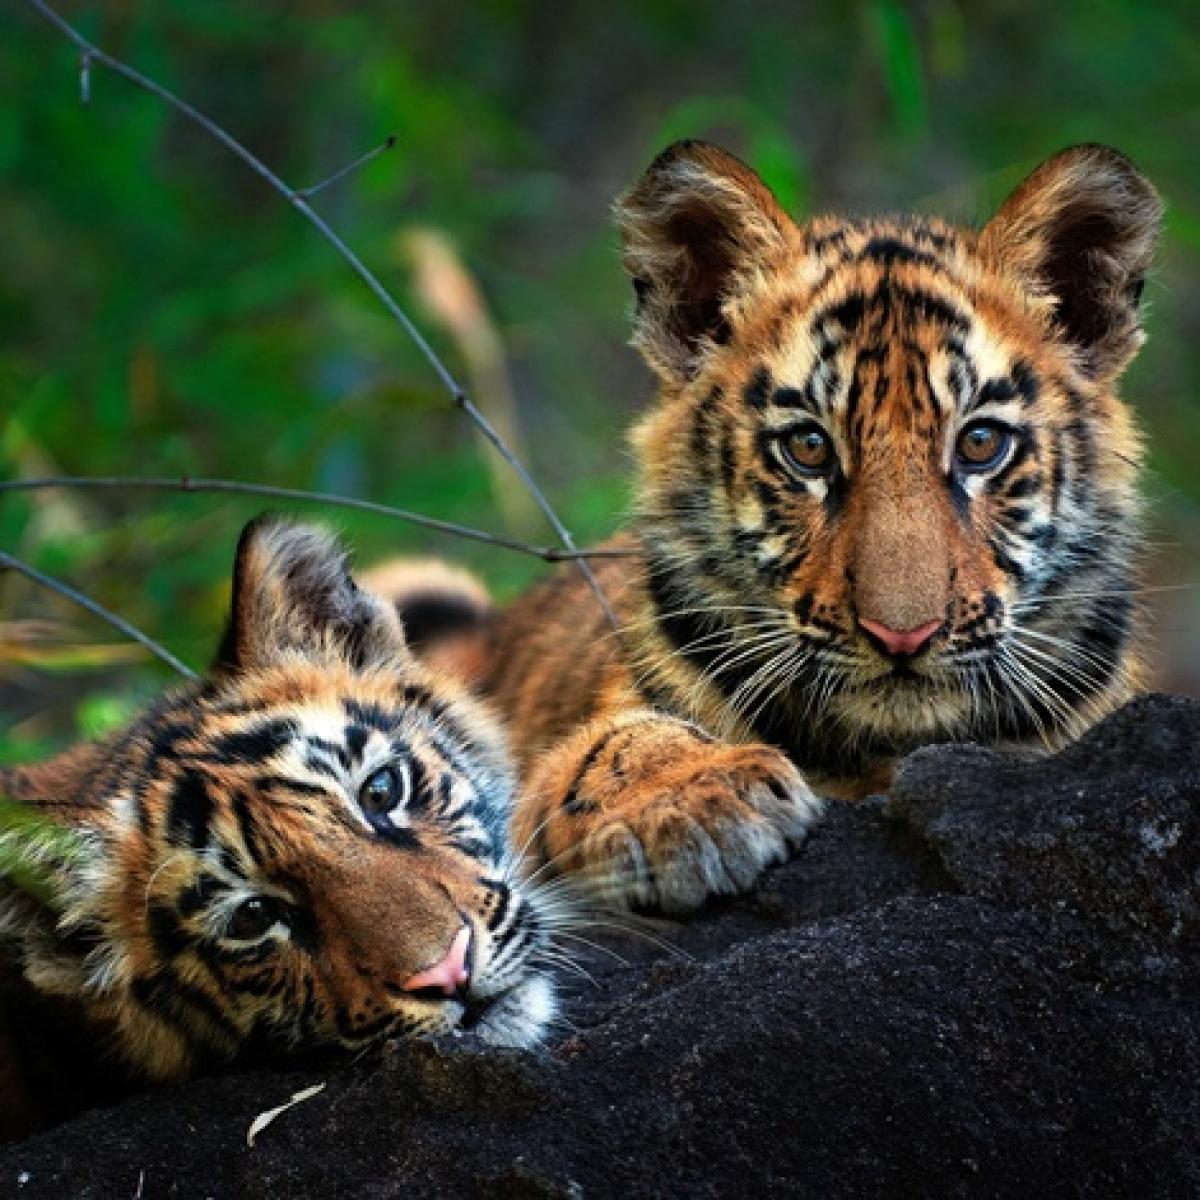 Conservation efforts double Maharashtra tiger population since 2010